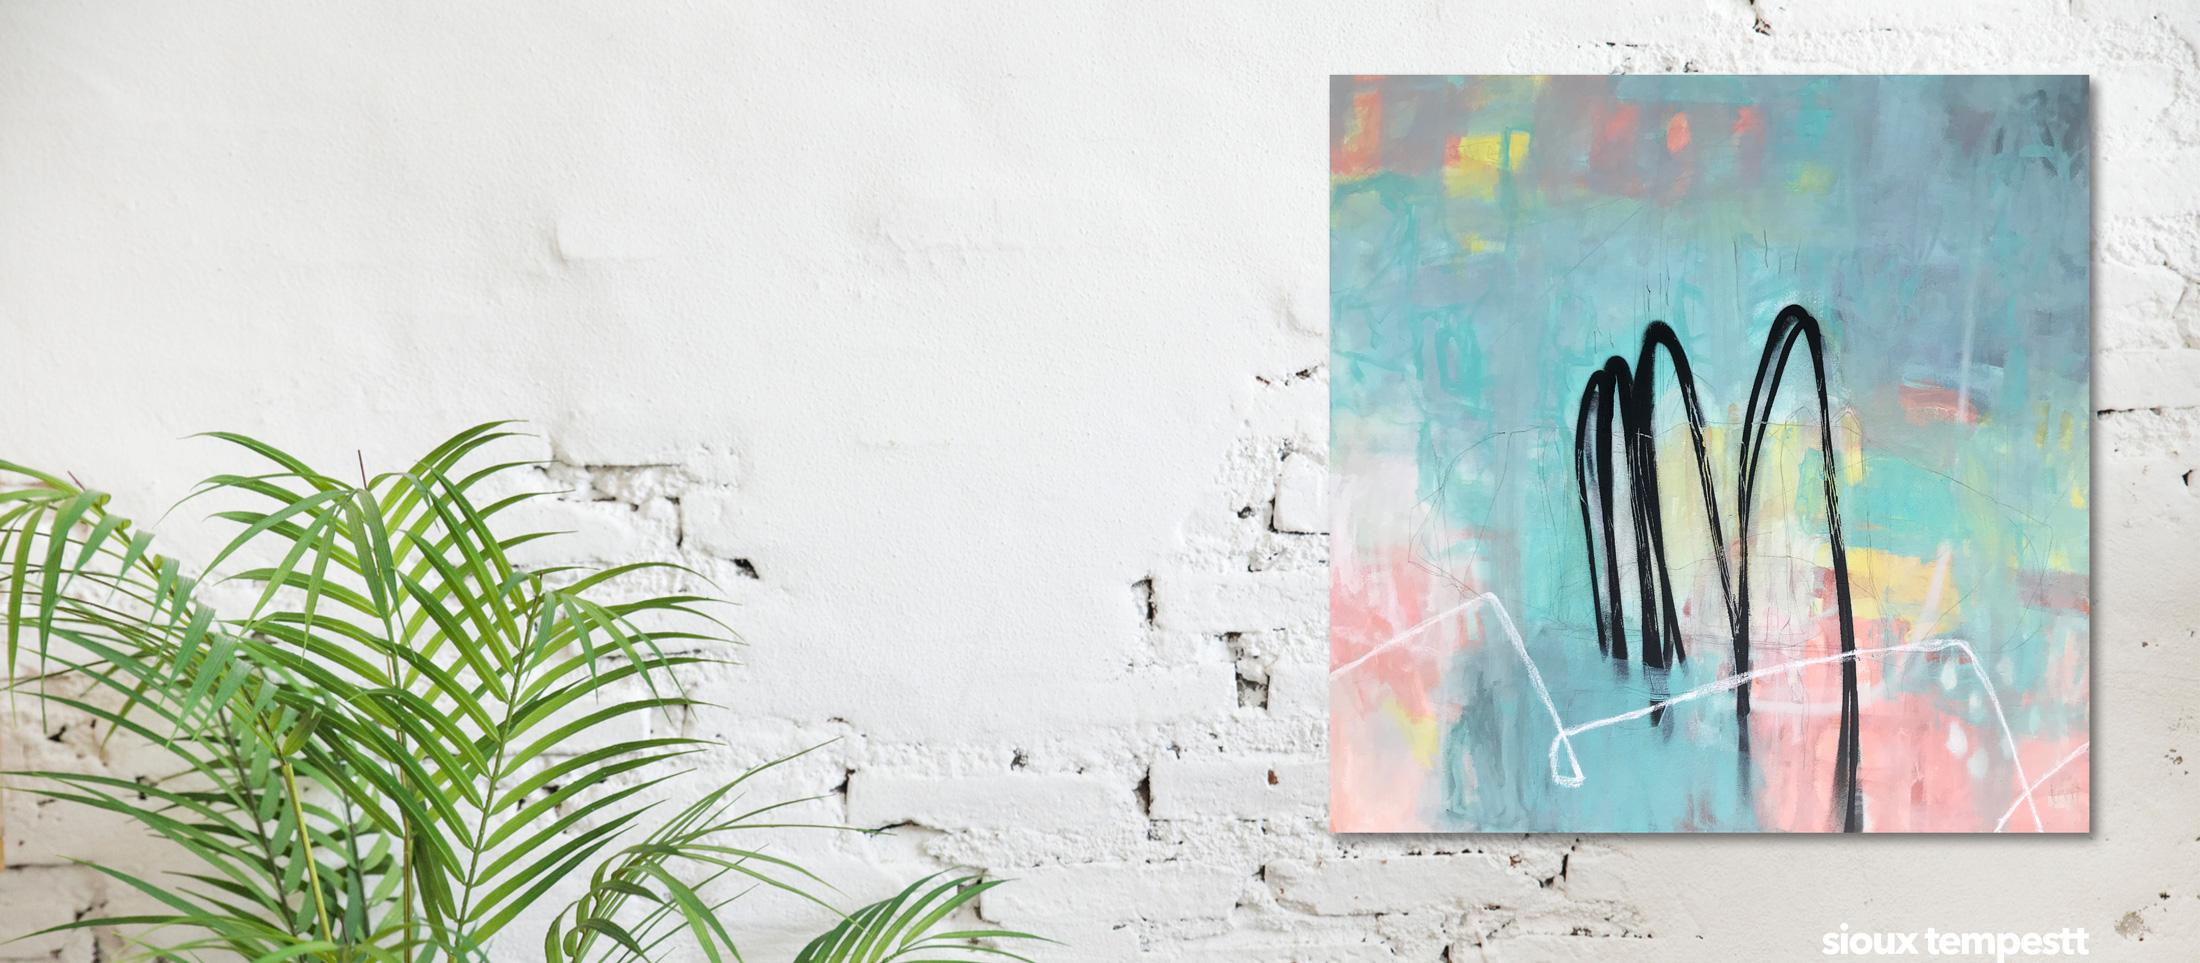 website-banners-20202